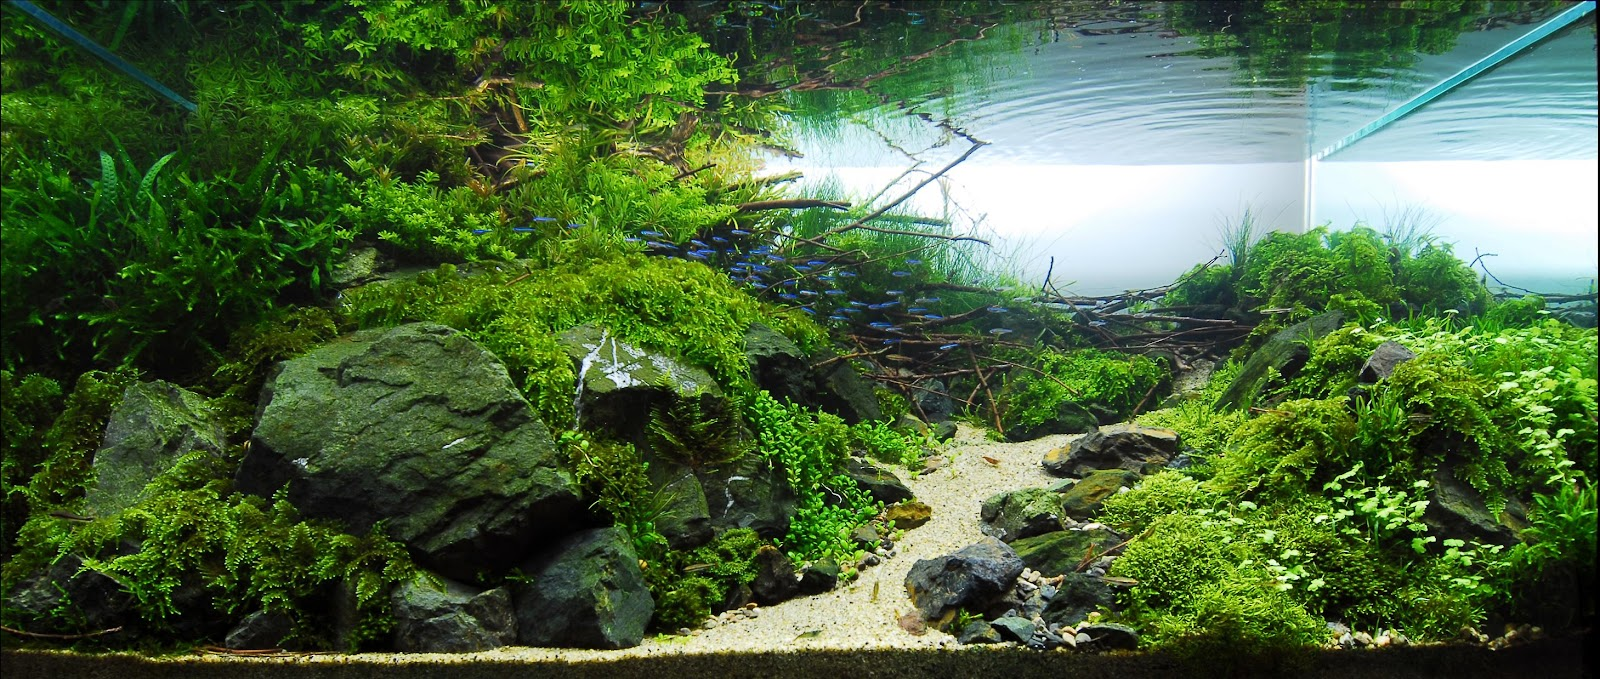 Paisajistas Subacuaticos: Acuarios con Paisajes acuaticos ...